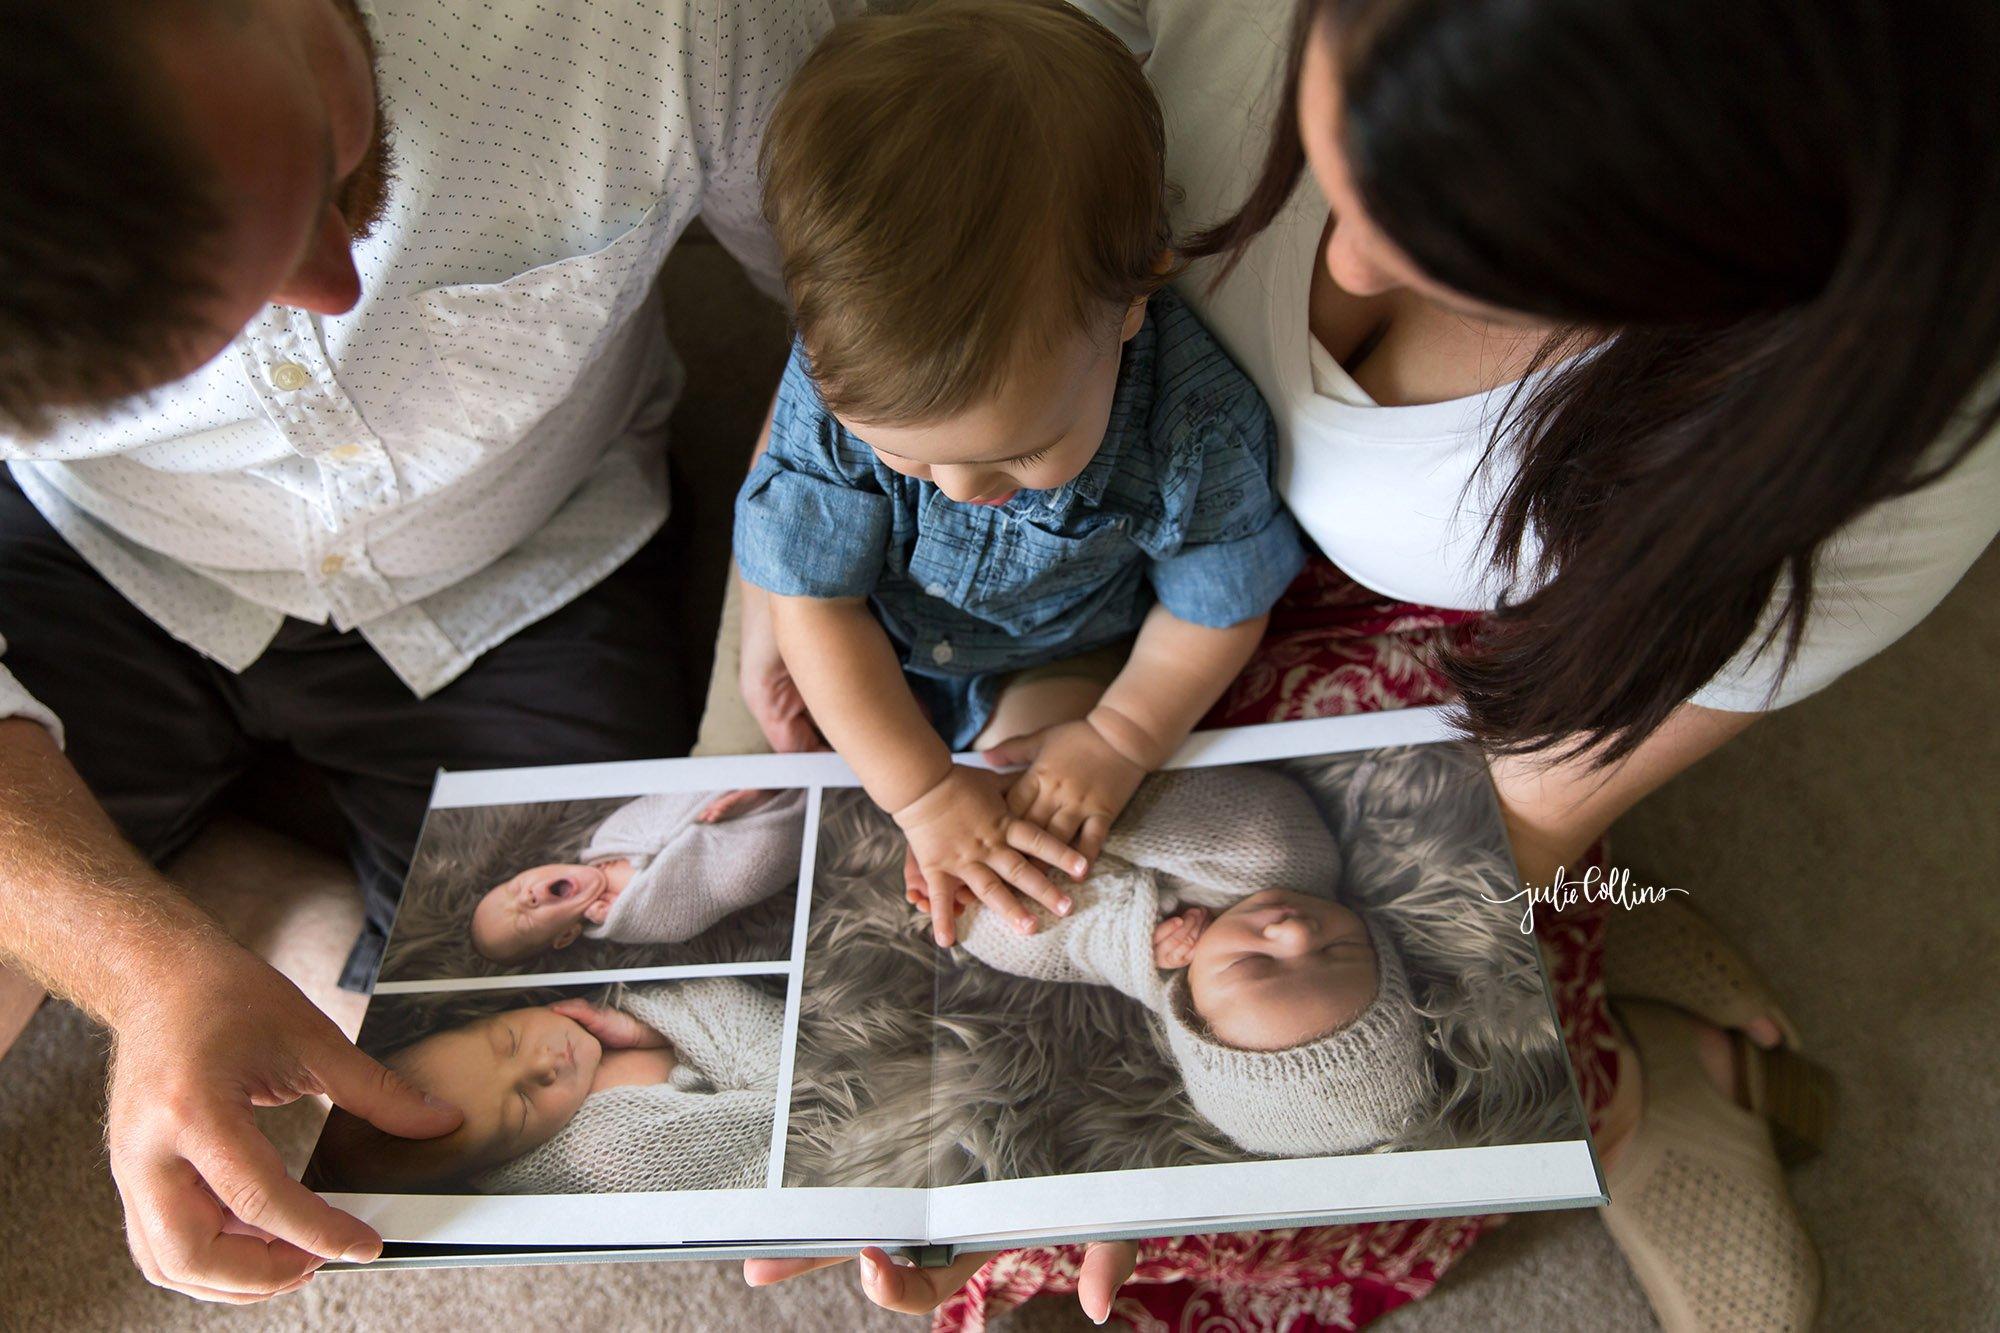 Family of three looking through baby photo album